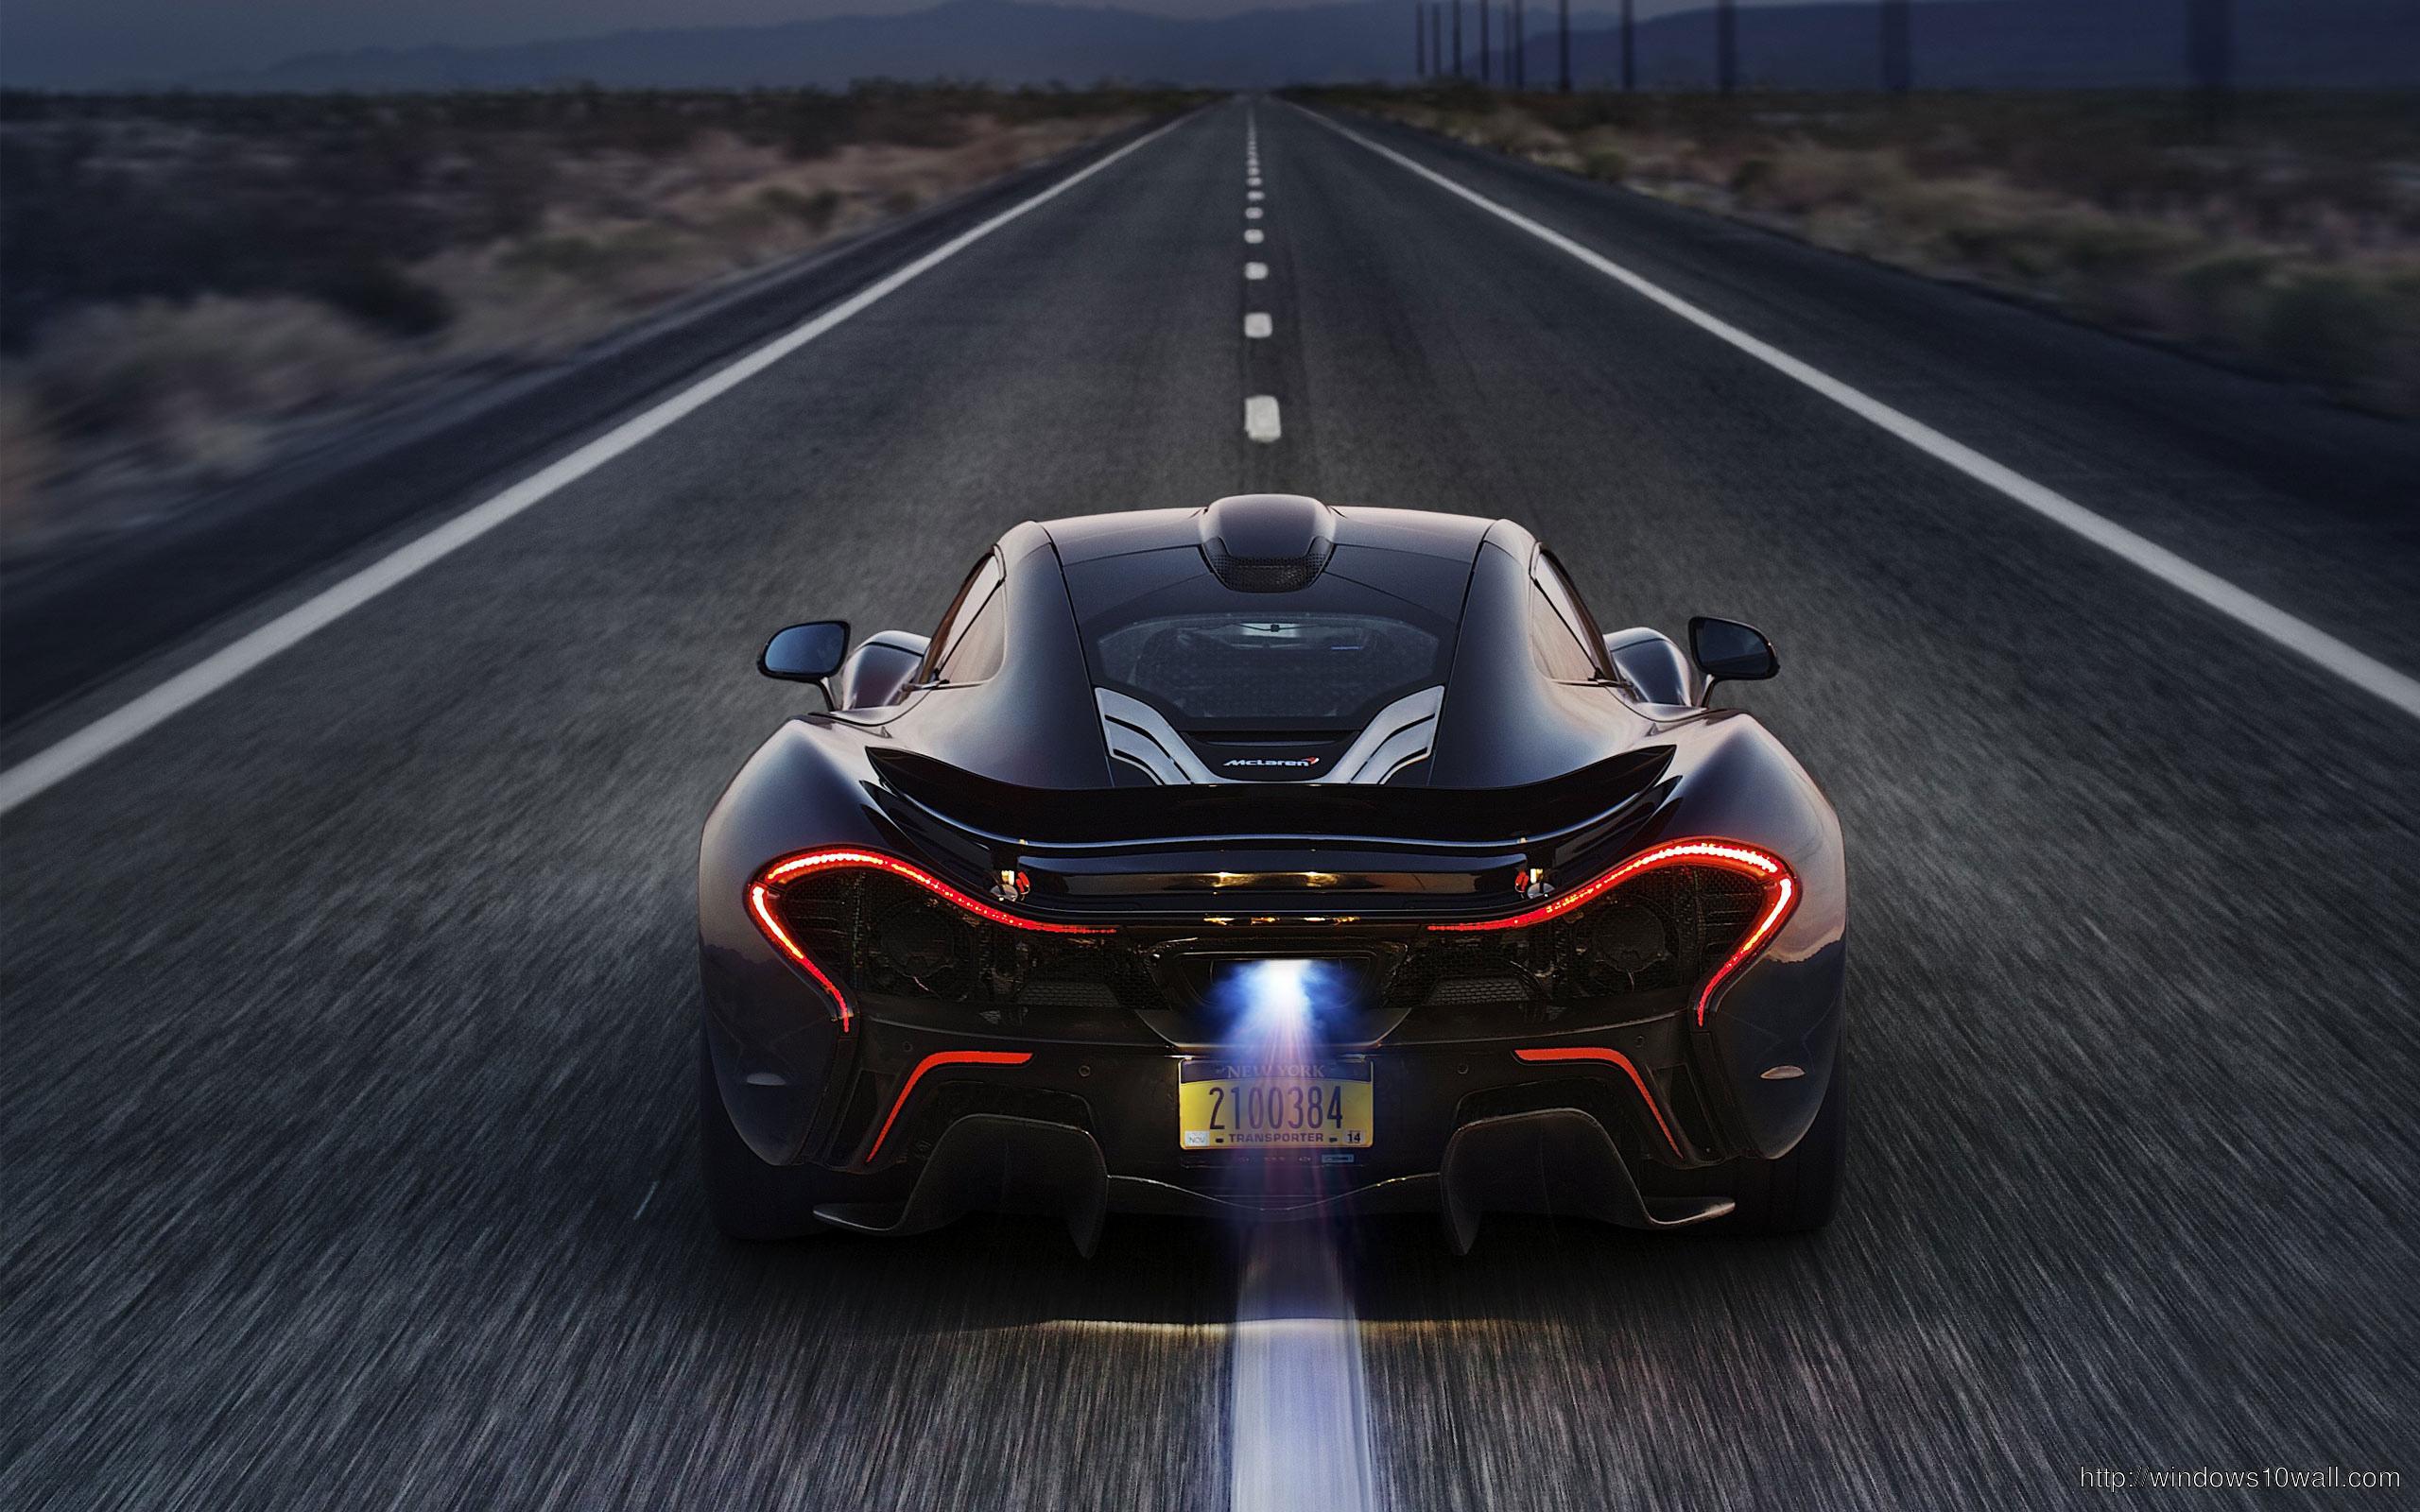 On Road Stunning McLaren P1 2014 Background Wallpaper